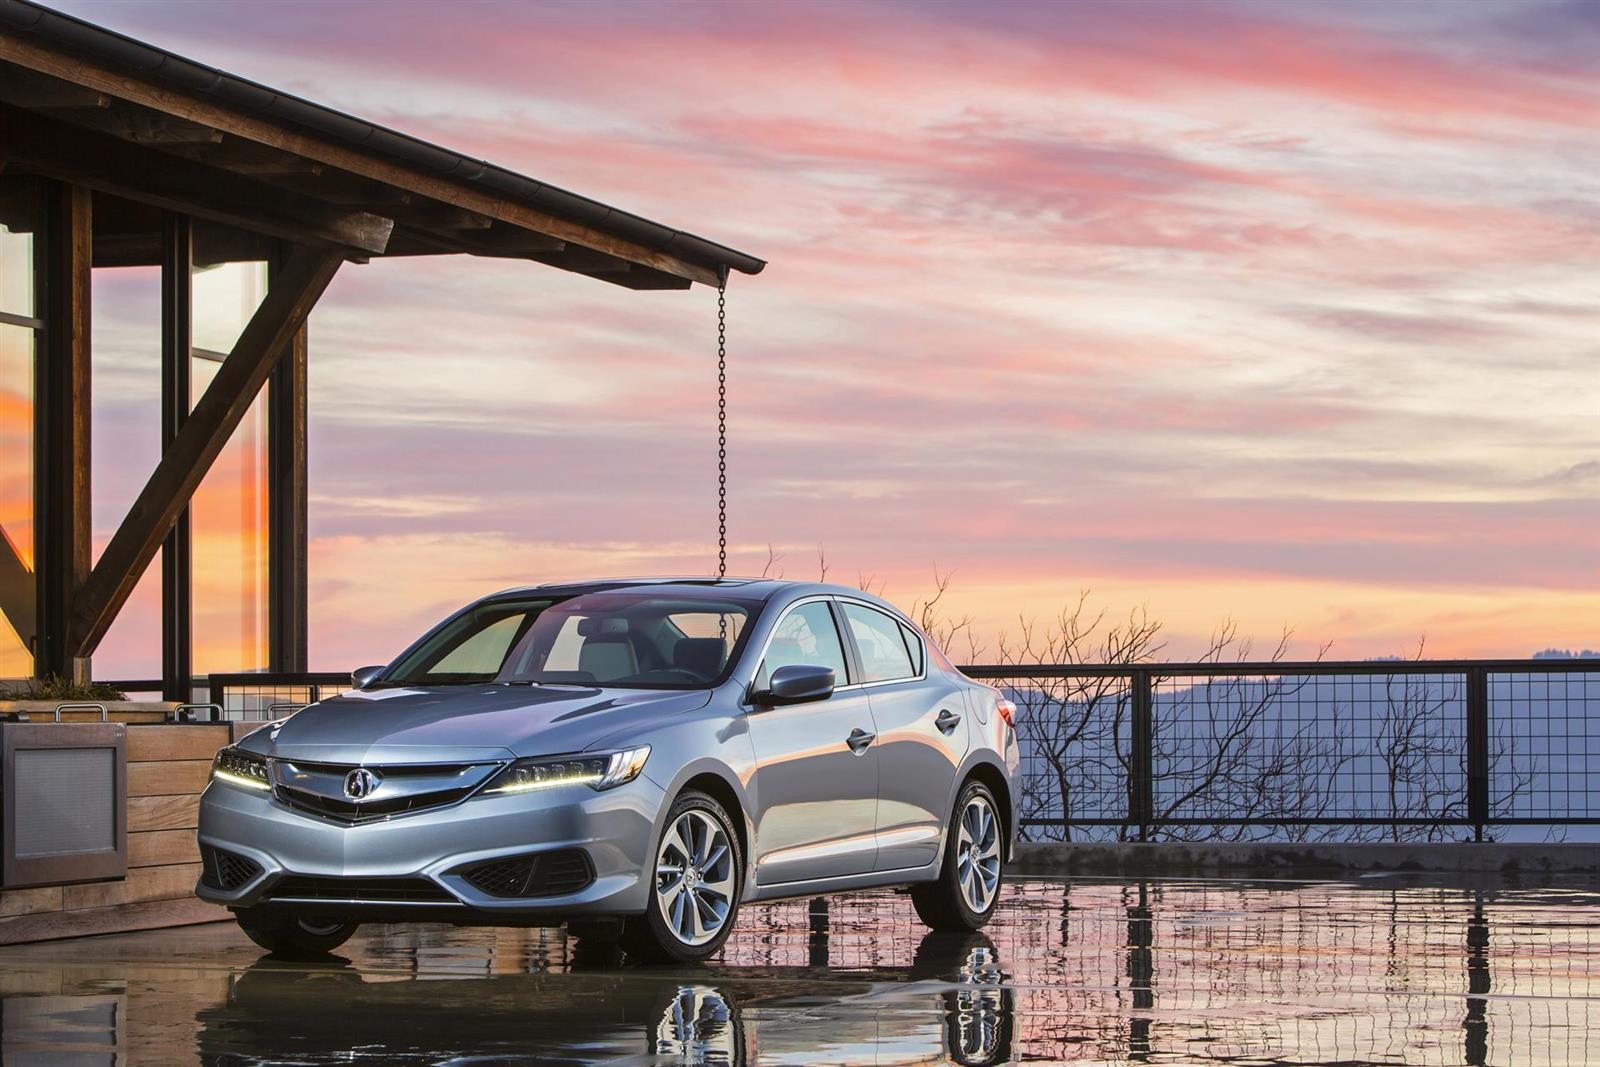 http://www.conceptcarz.com/images/Acura/2017-Acura-ILX_sedan-image-013-1600.jpg